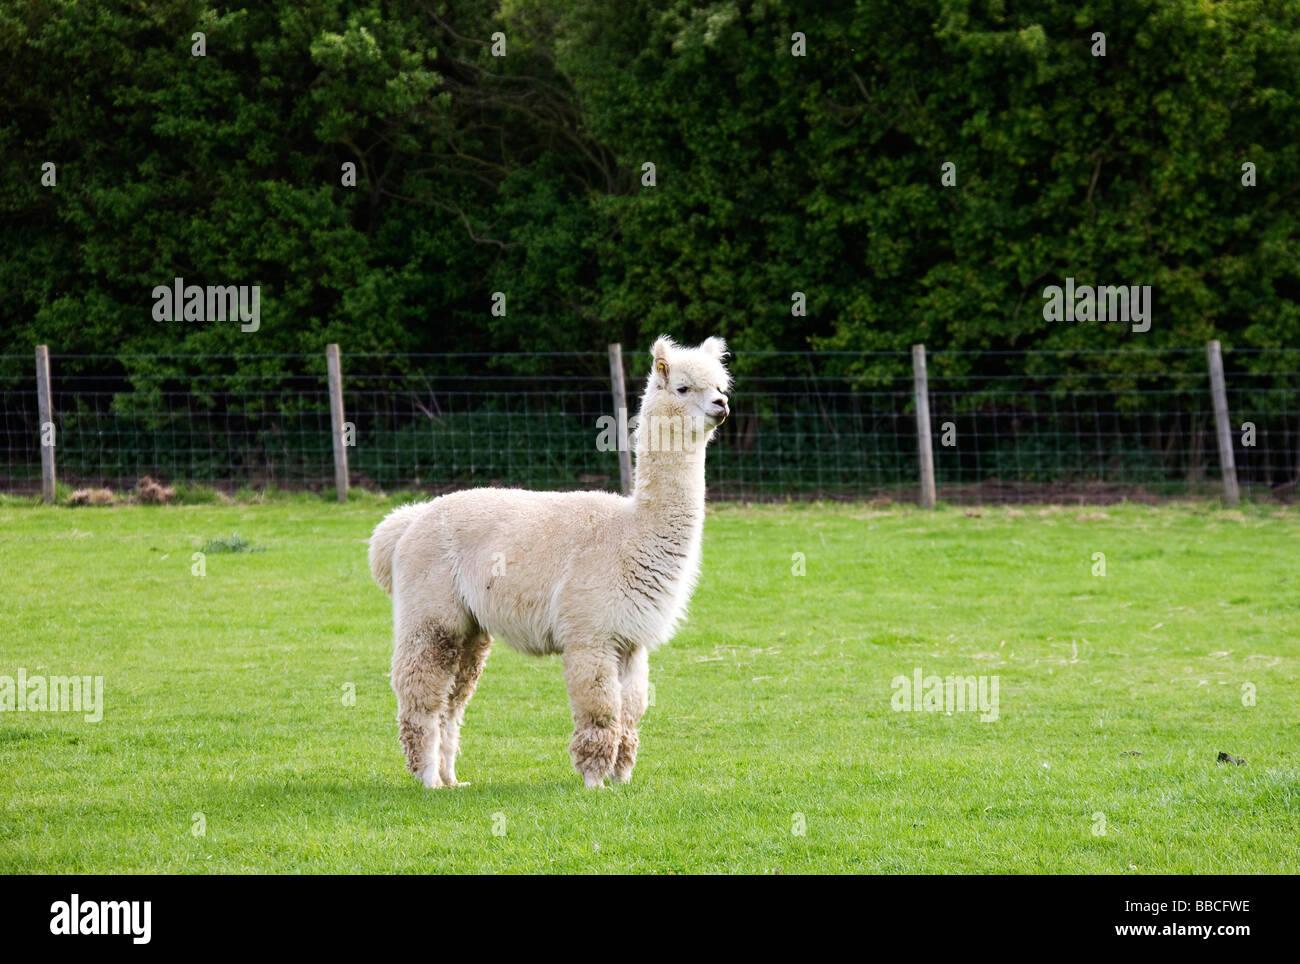 An Alpaca, Lama pacos,standing in paddock. - Stock Image